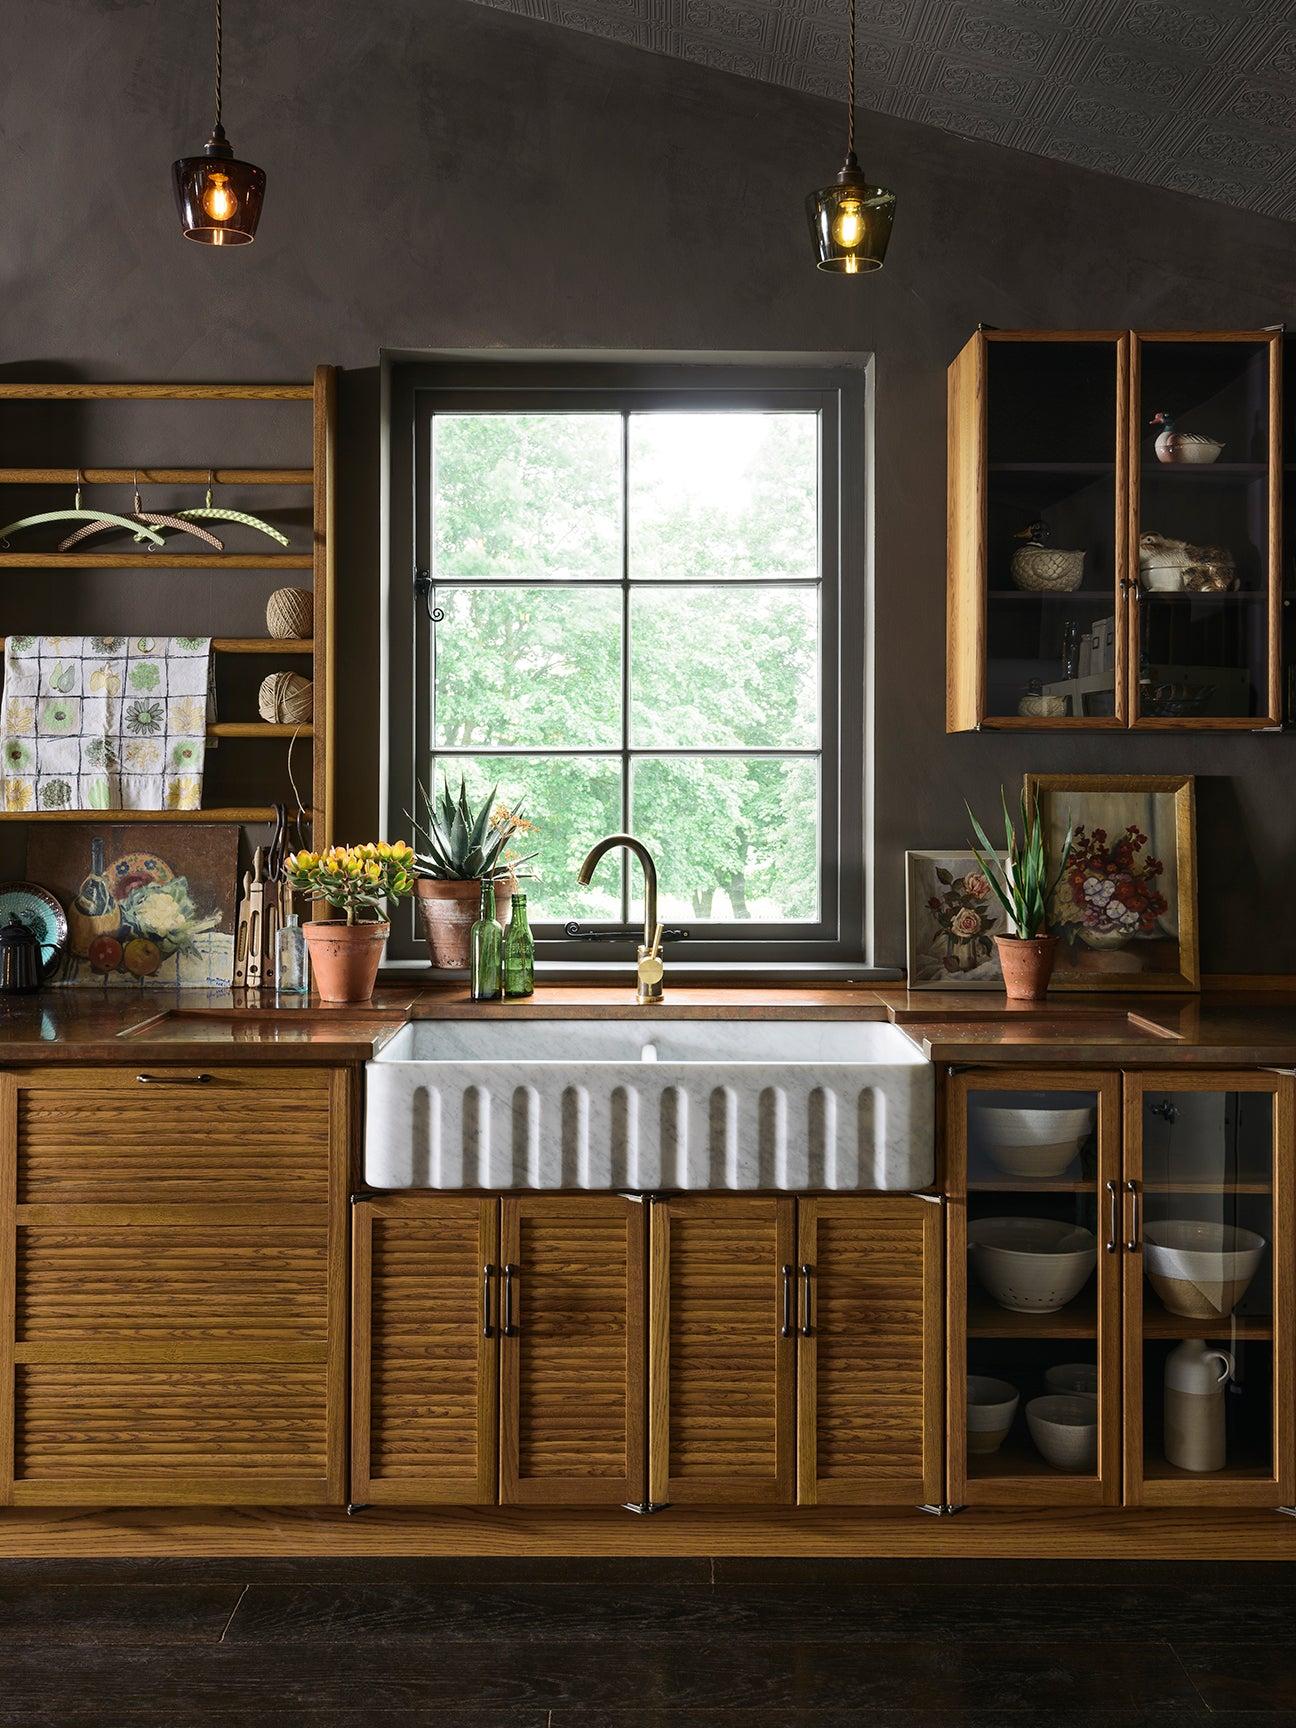 tambour wooden kitchen cabinets